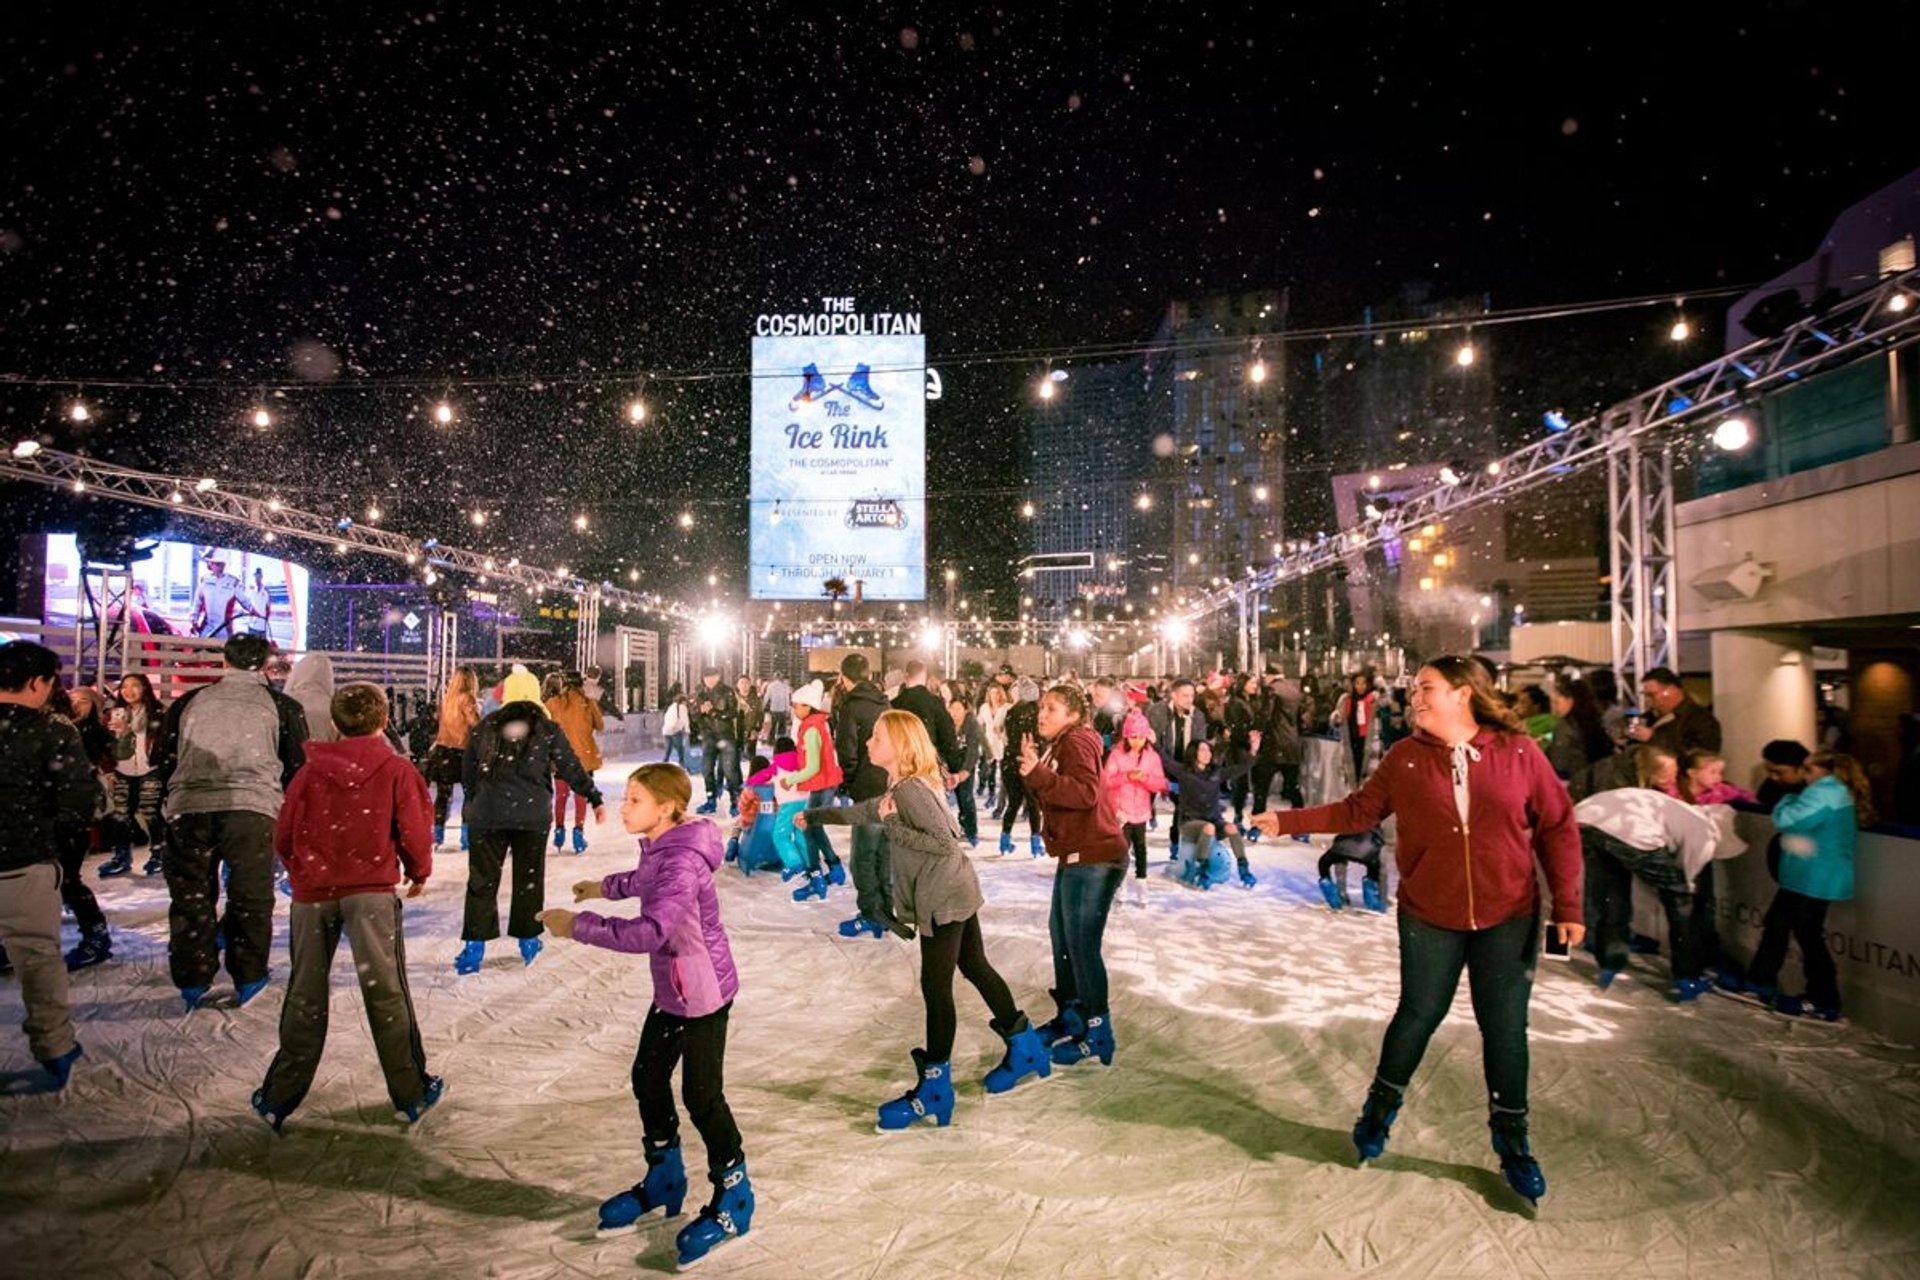 Ice Rink at the Cosmopolitan in Las Vegas 2020 - Best Time